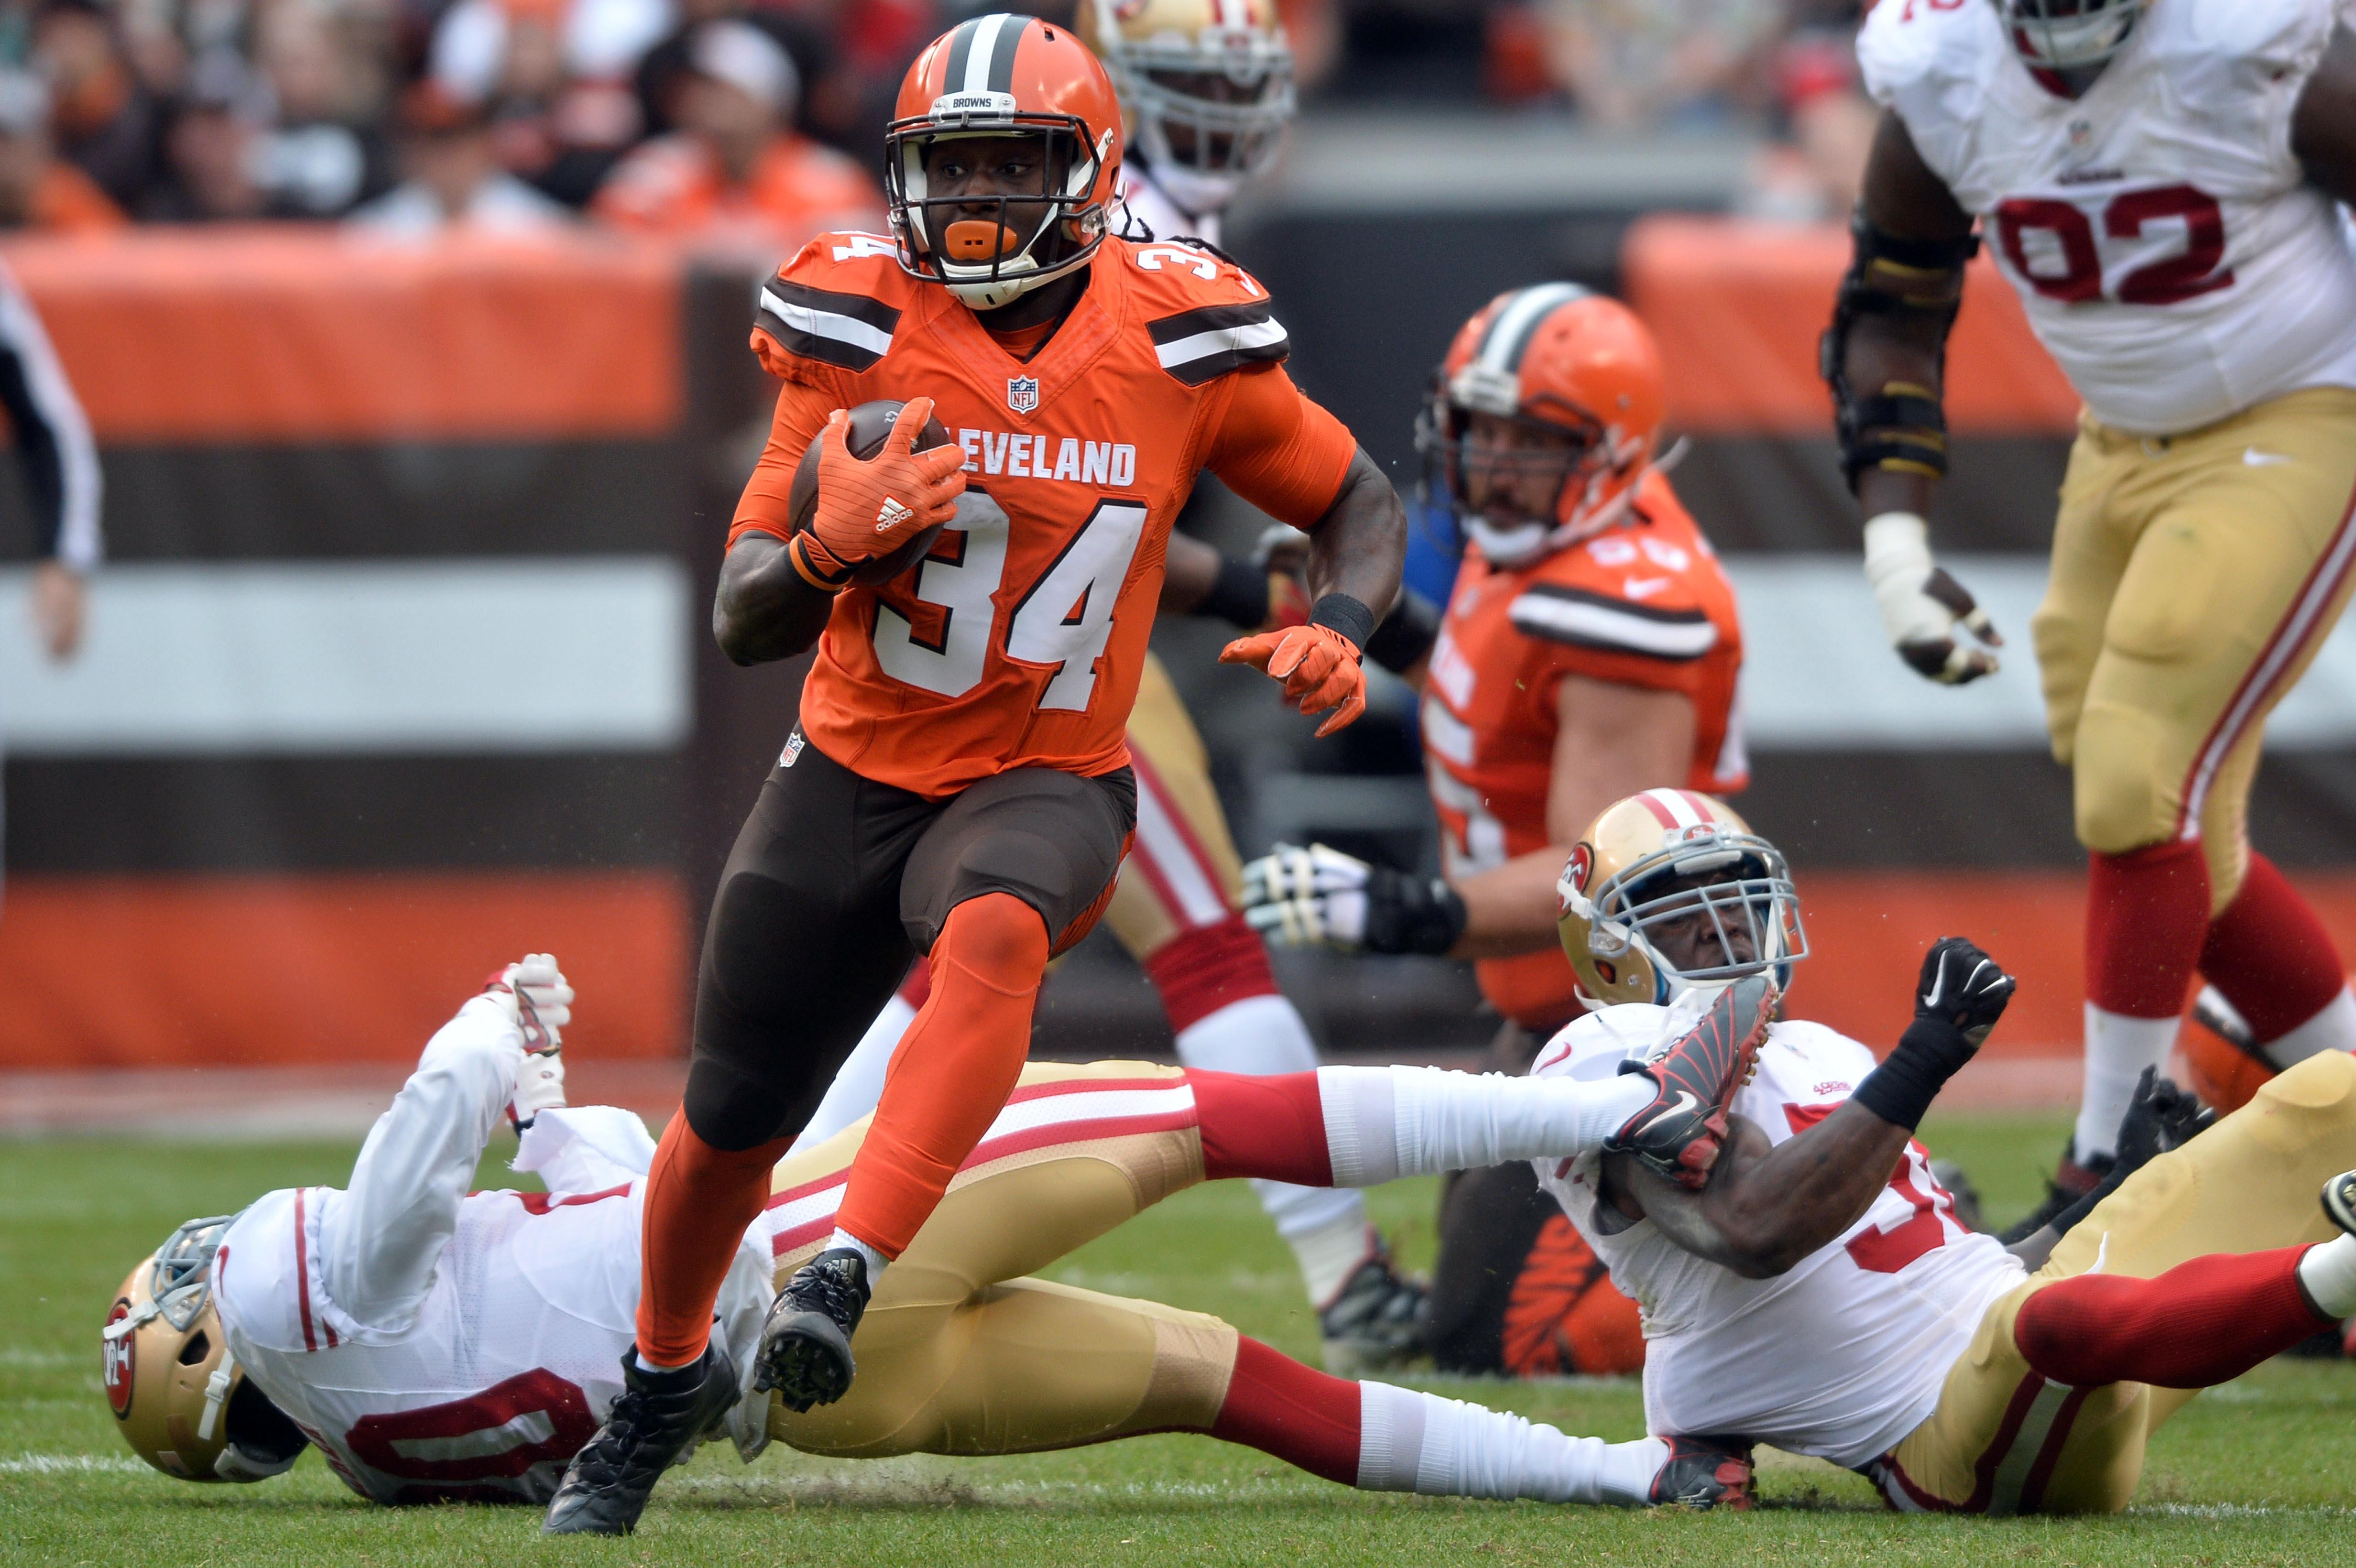 NFL: San Francisco 49ers at Cleveland Browns